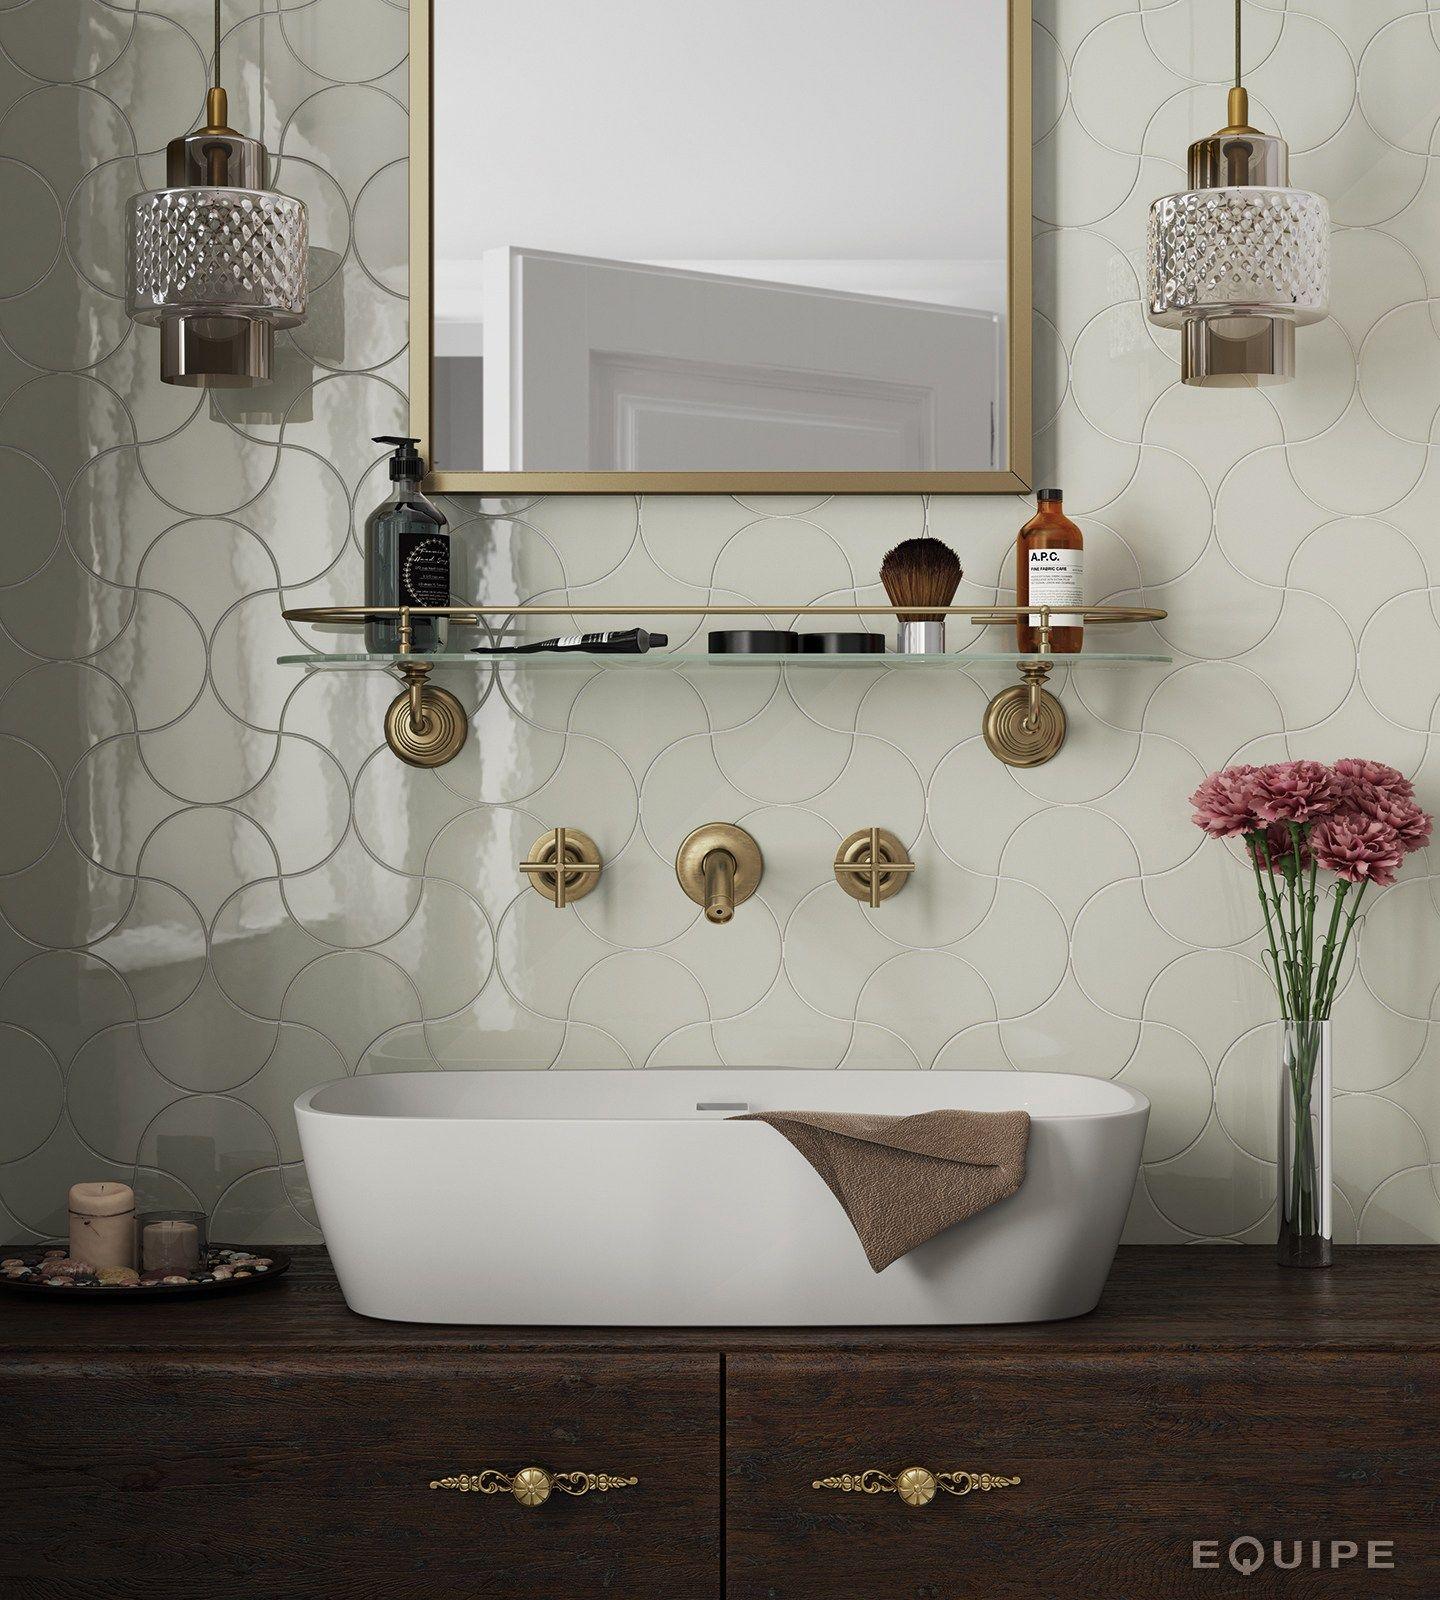 Scale wall tiles by equipe ceramicas - Equipe ceramicas ...